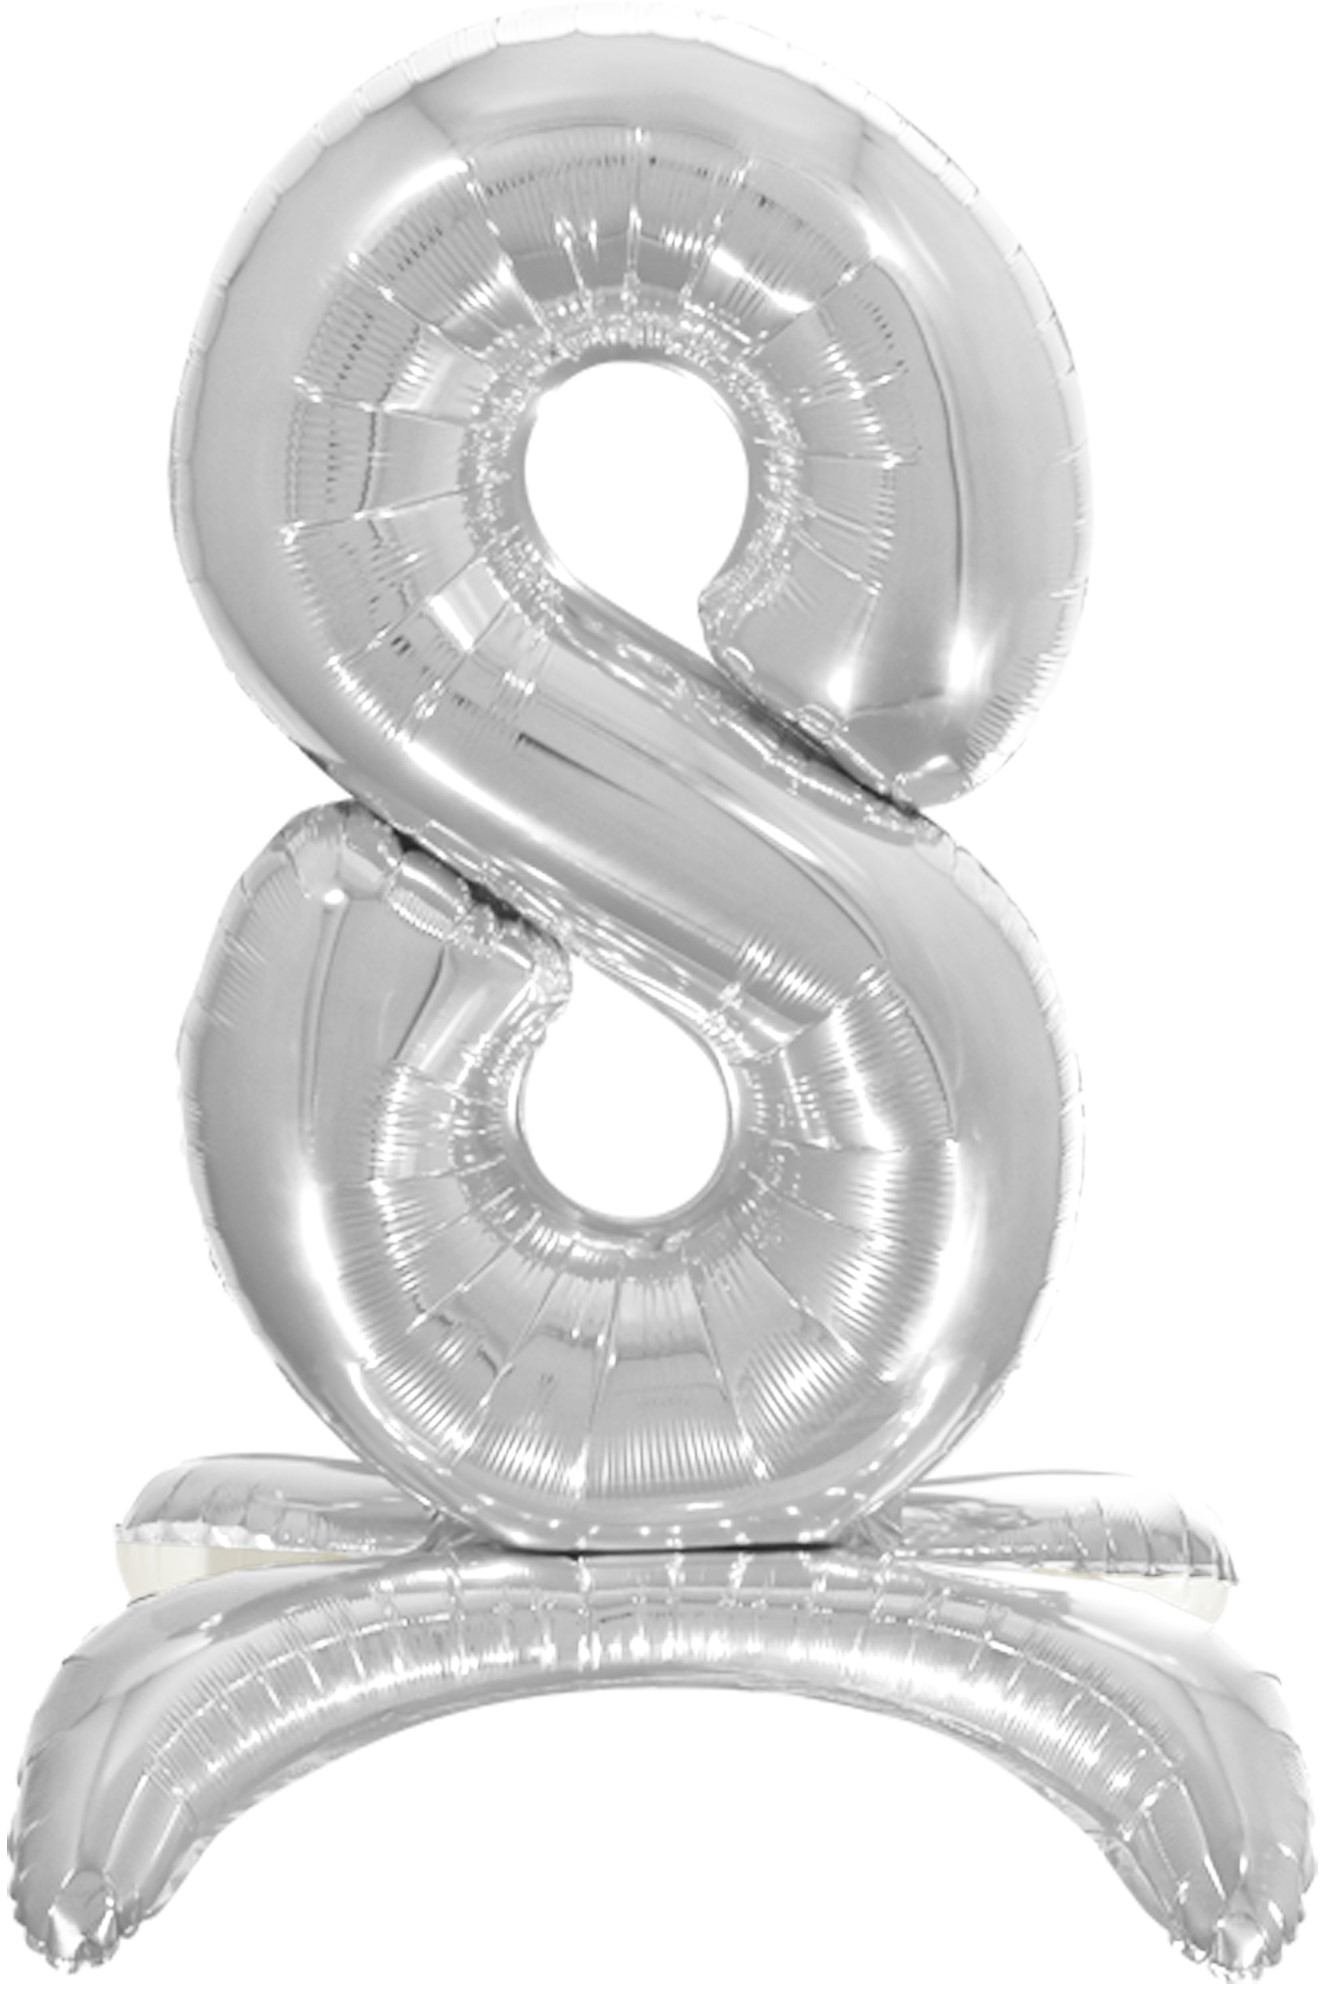 Шар (32''/81 см) Цифра под воздух 8 на подставке Серебро Falali